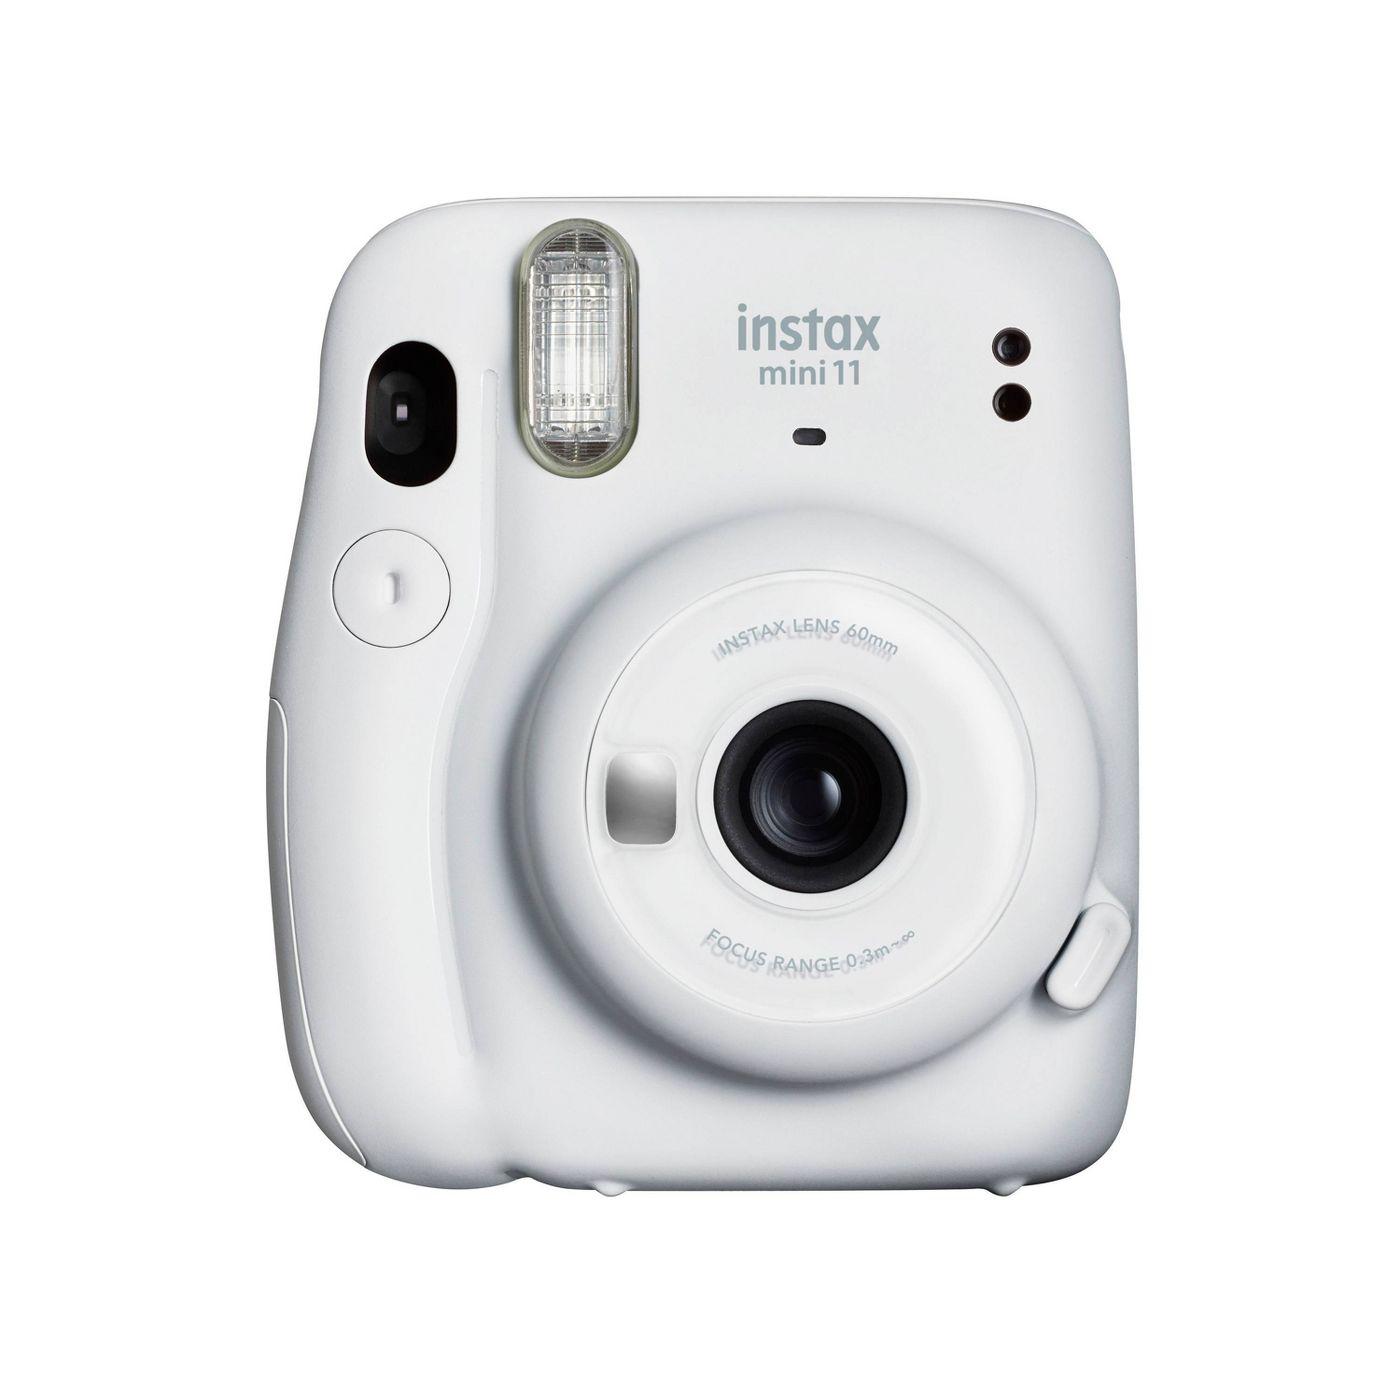 Fujifilm Instax Mini 11 Camera - image 1 of 4